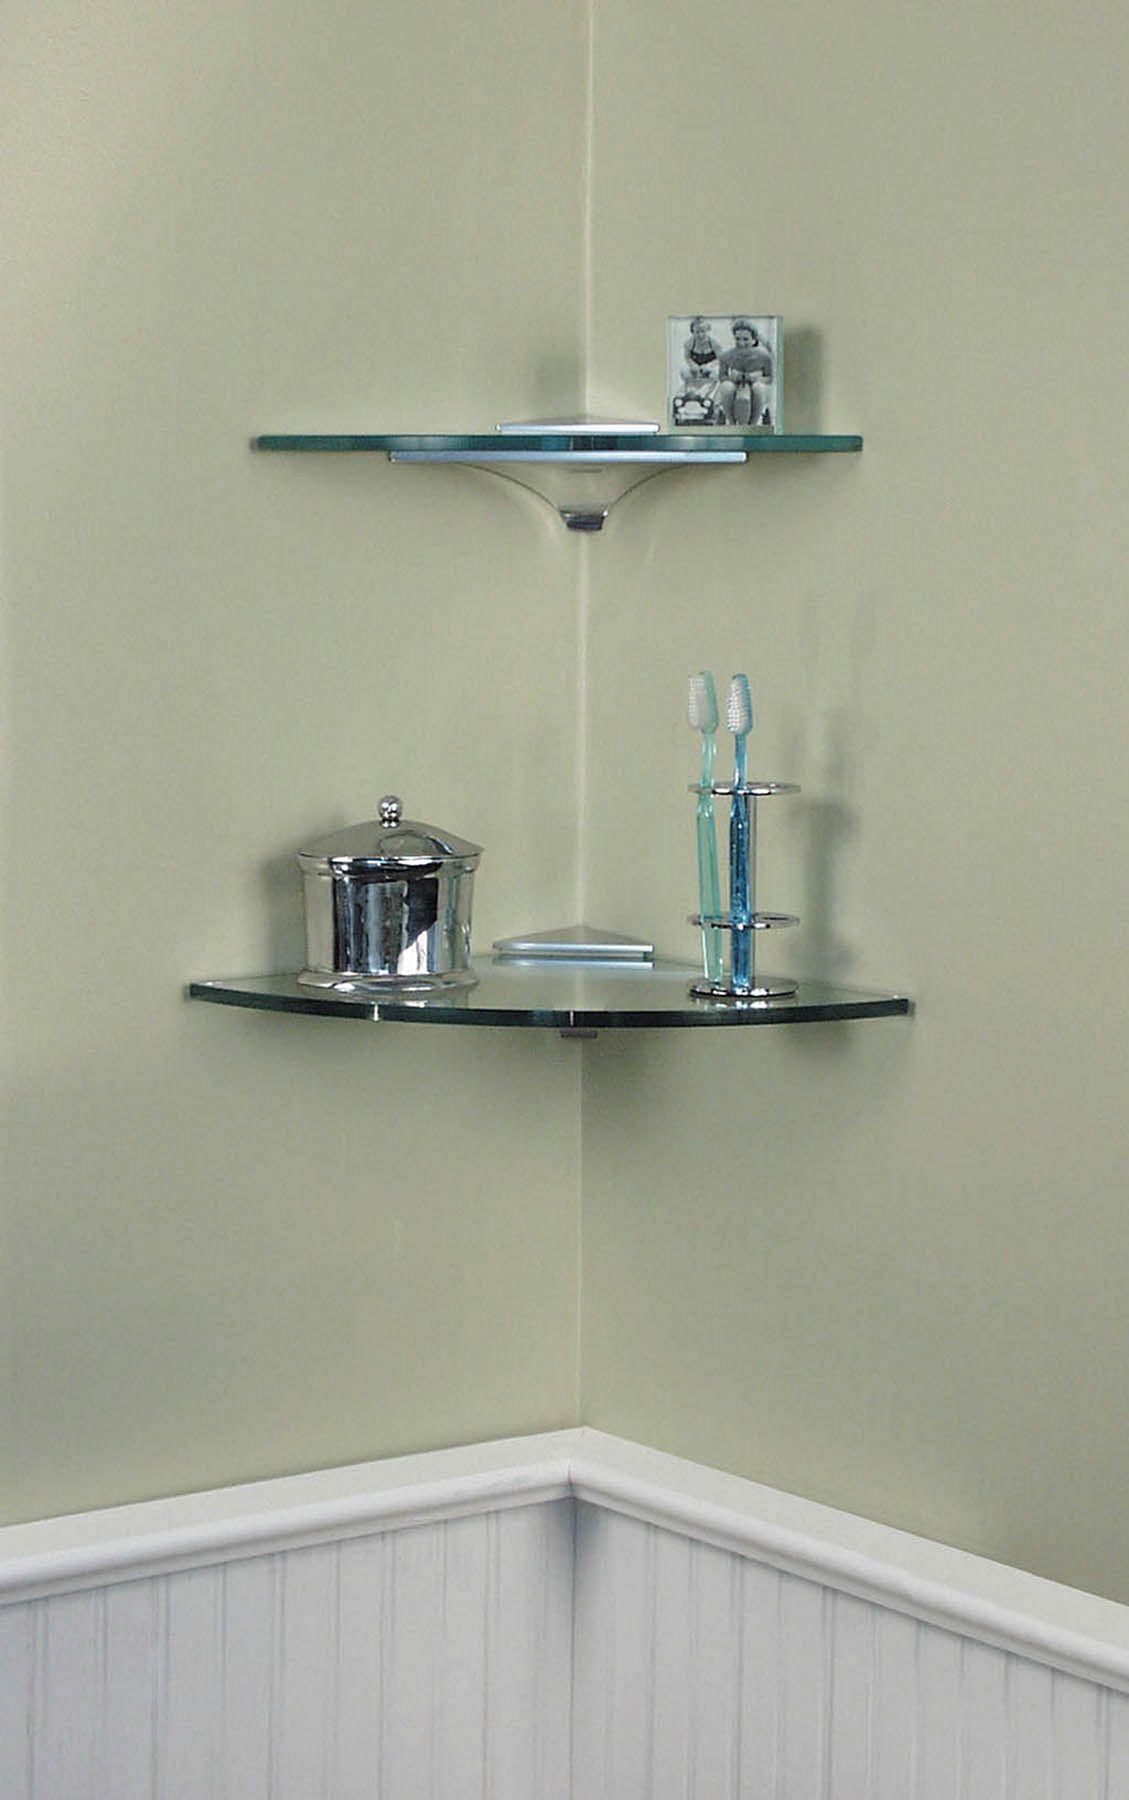 12 Marvelous Bathroom Shelves Decoration Ideas For Small Spaces